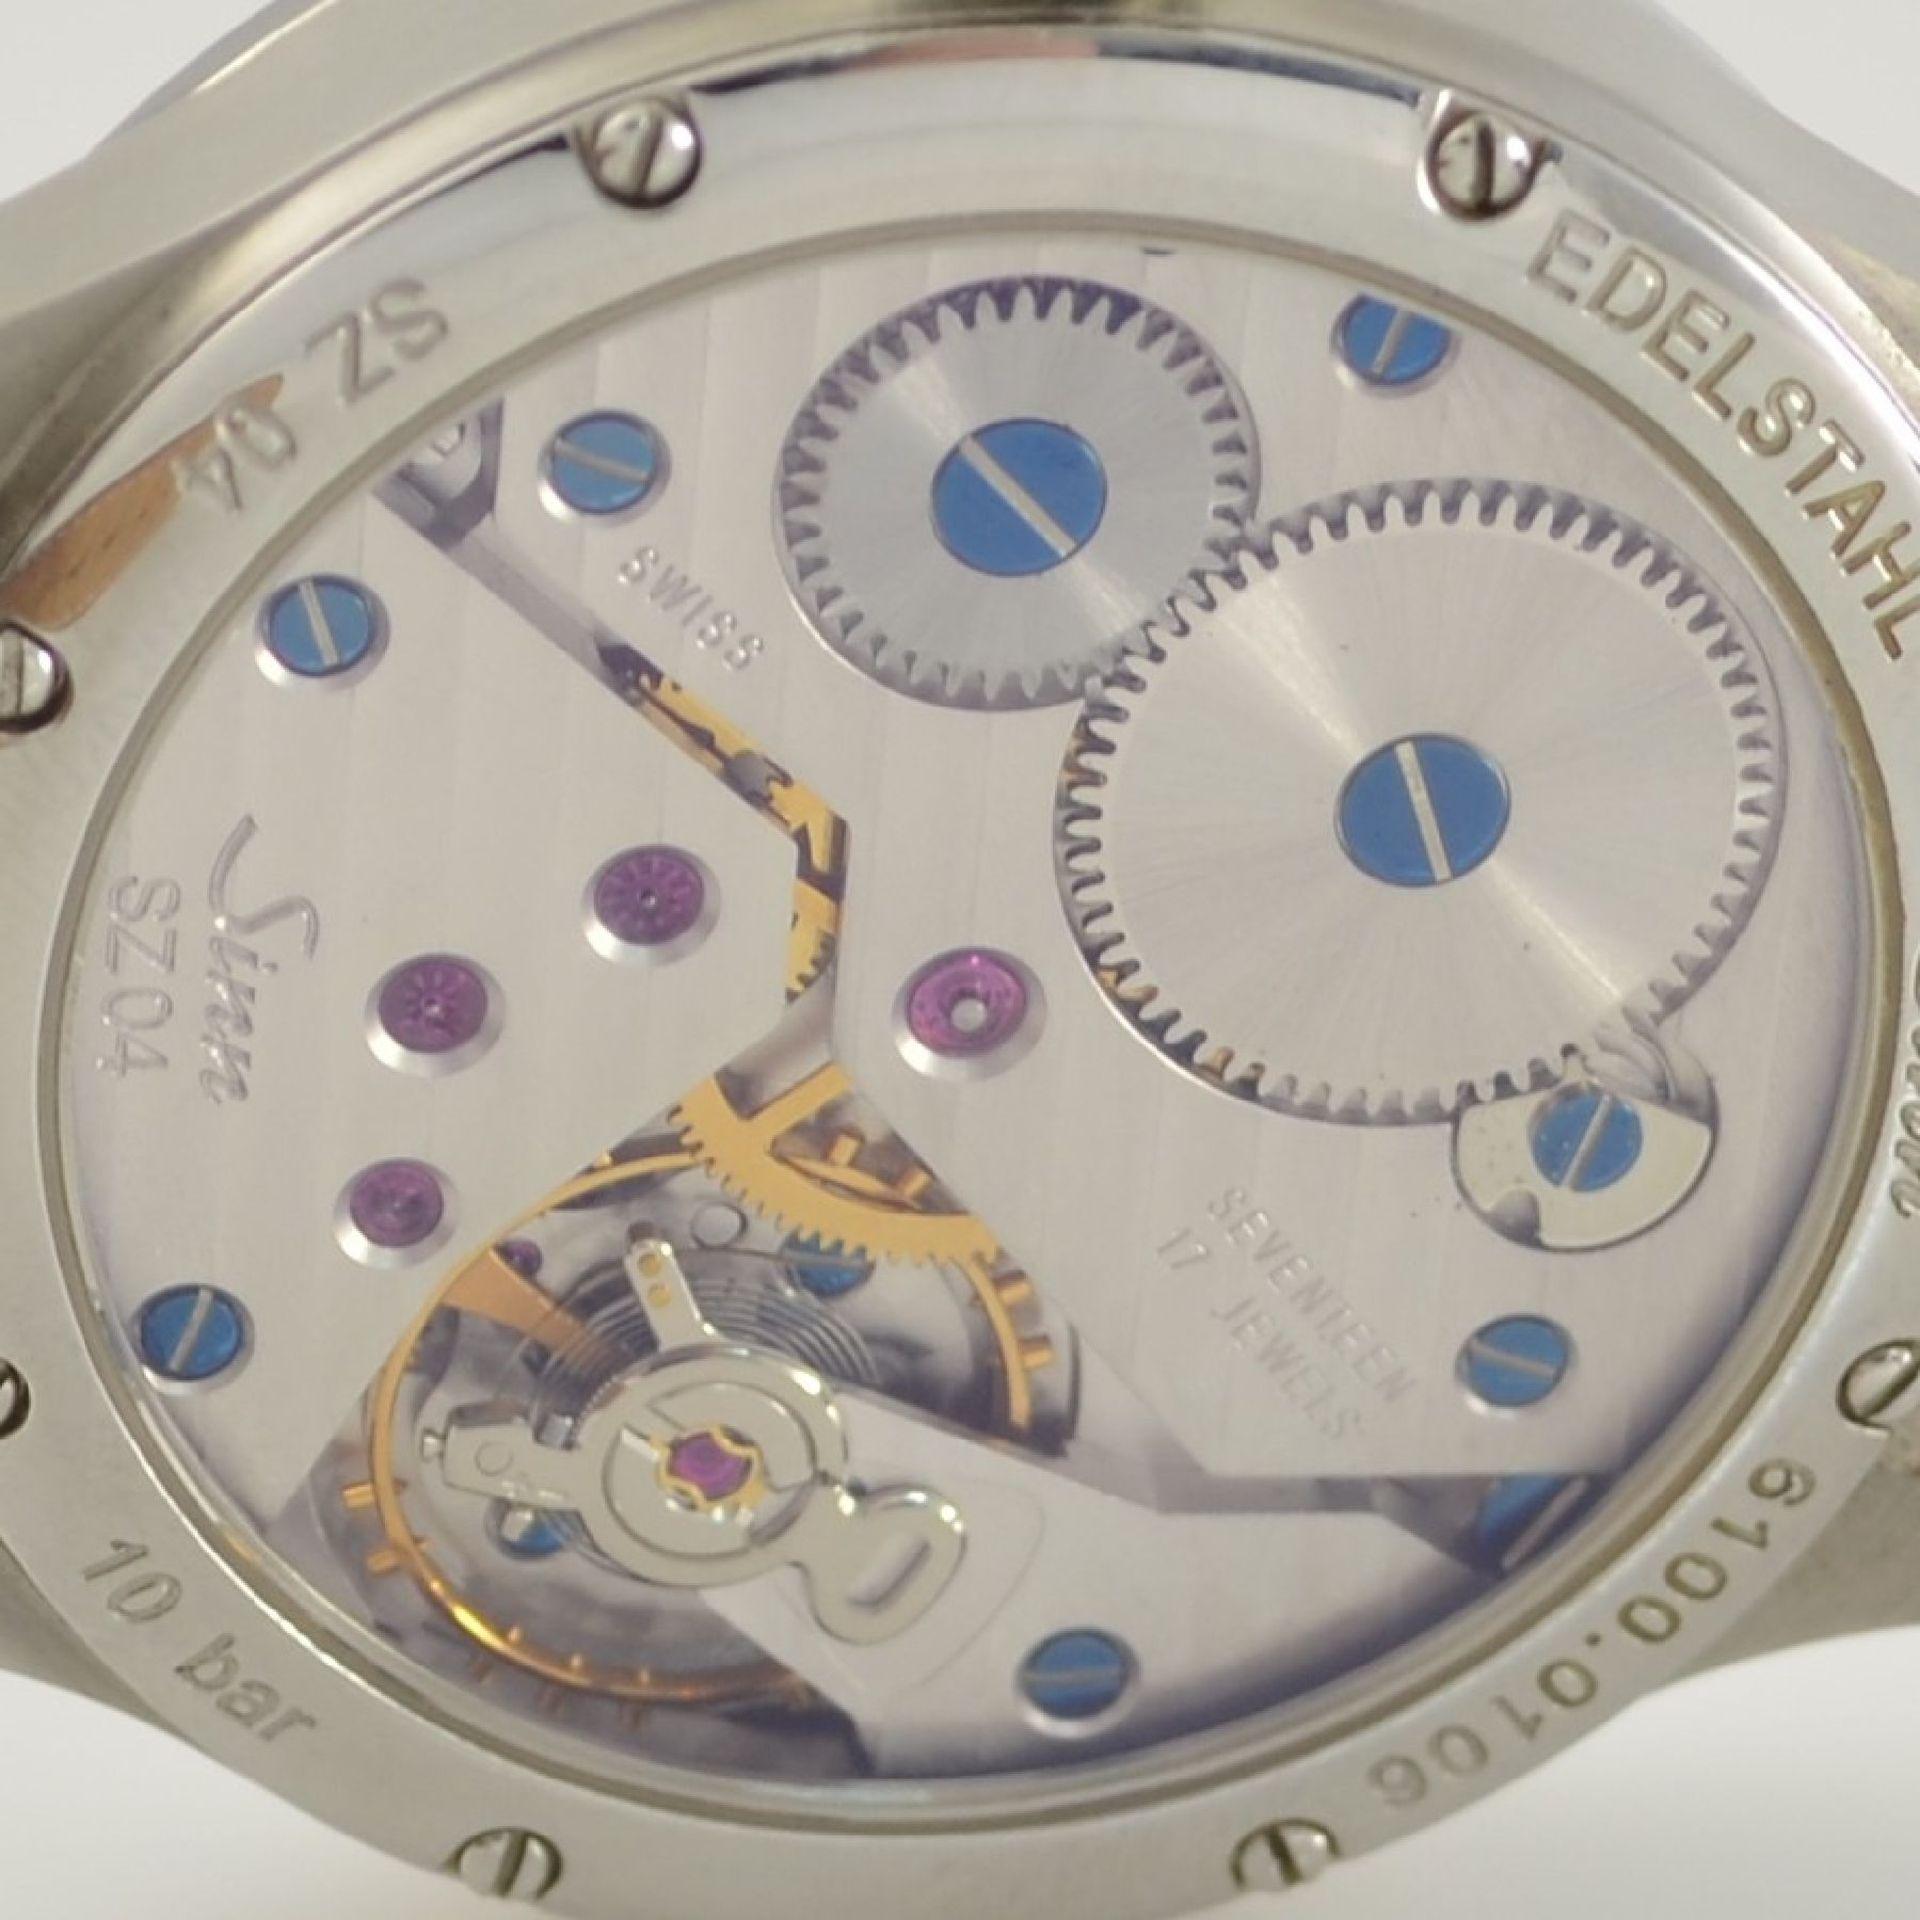 SINN Regulateur Herrenarmbanduhr in Stahl, Schweiz lt. beiliegendem orig. Papier verk. 12/2006, - Bild 8 aus 9